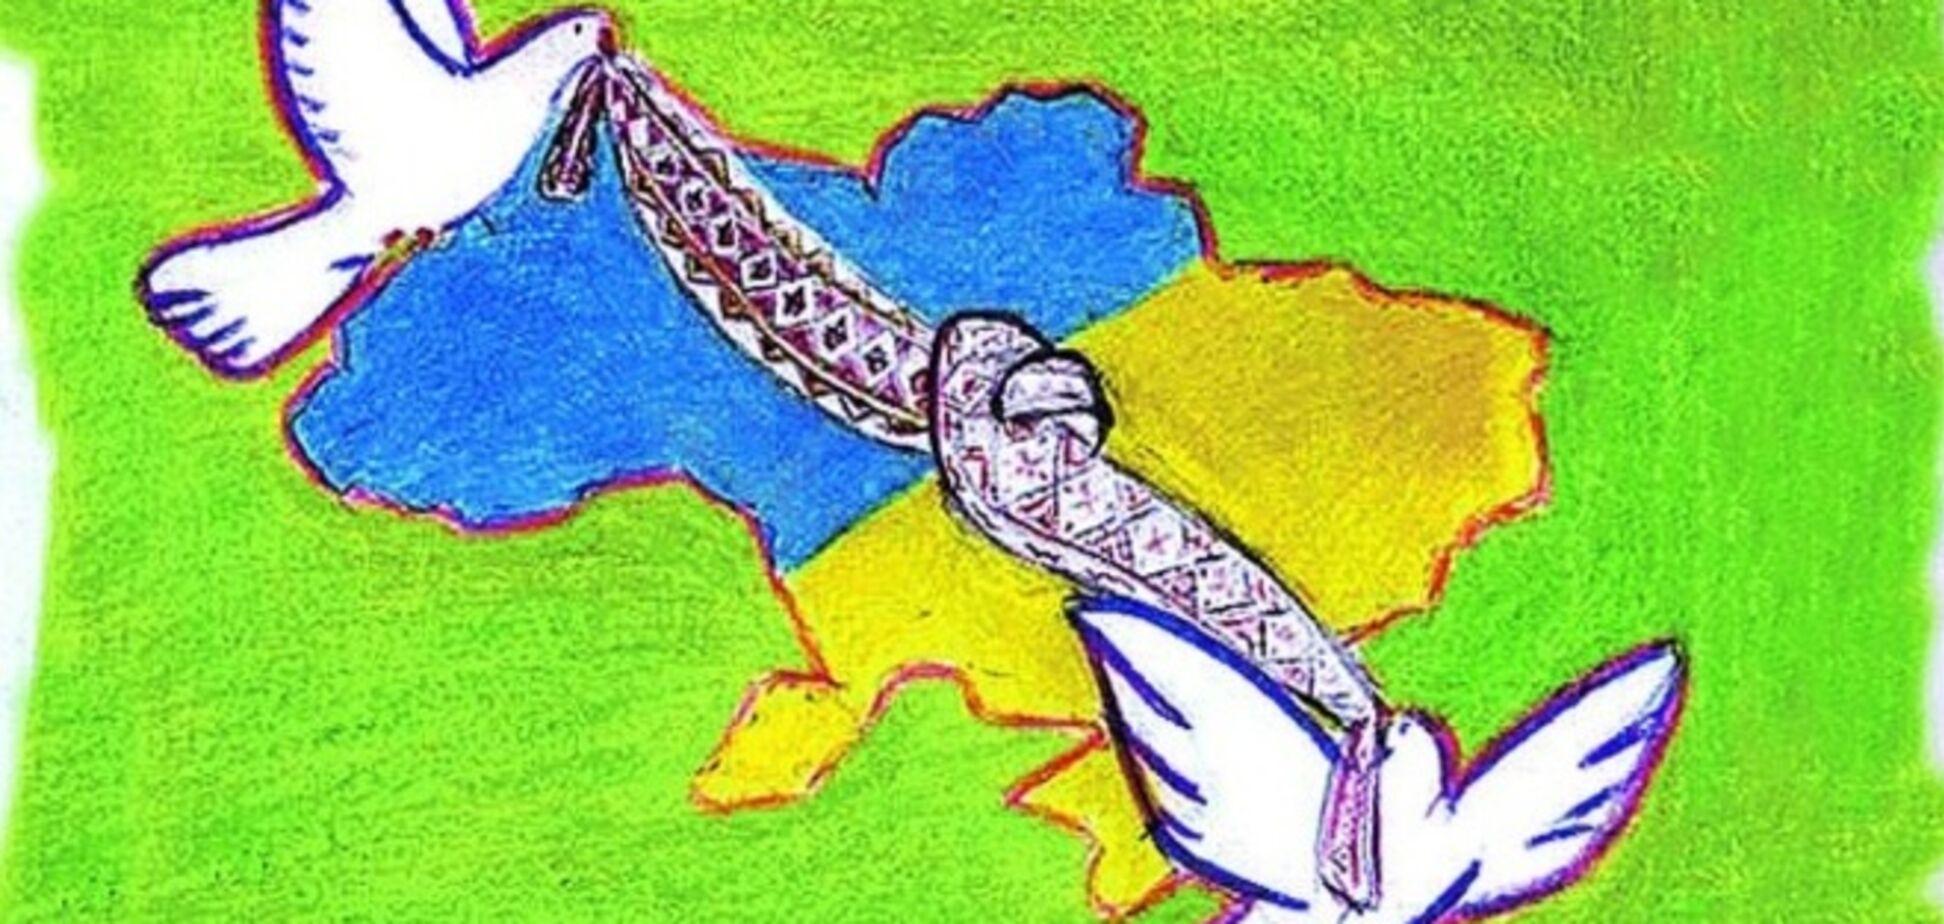 При въезде в Киев появится 'клумба единства'